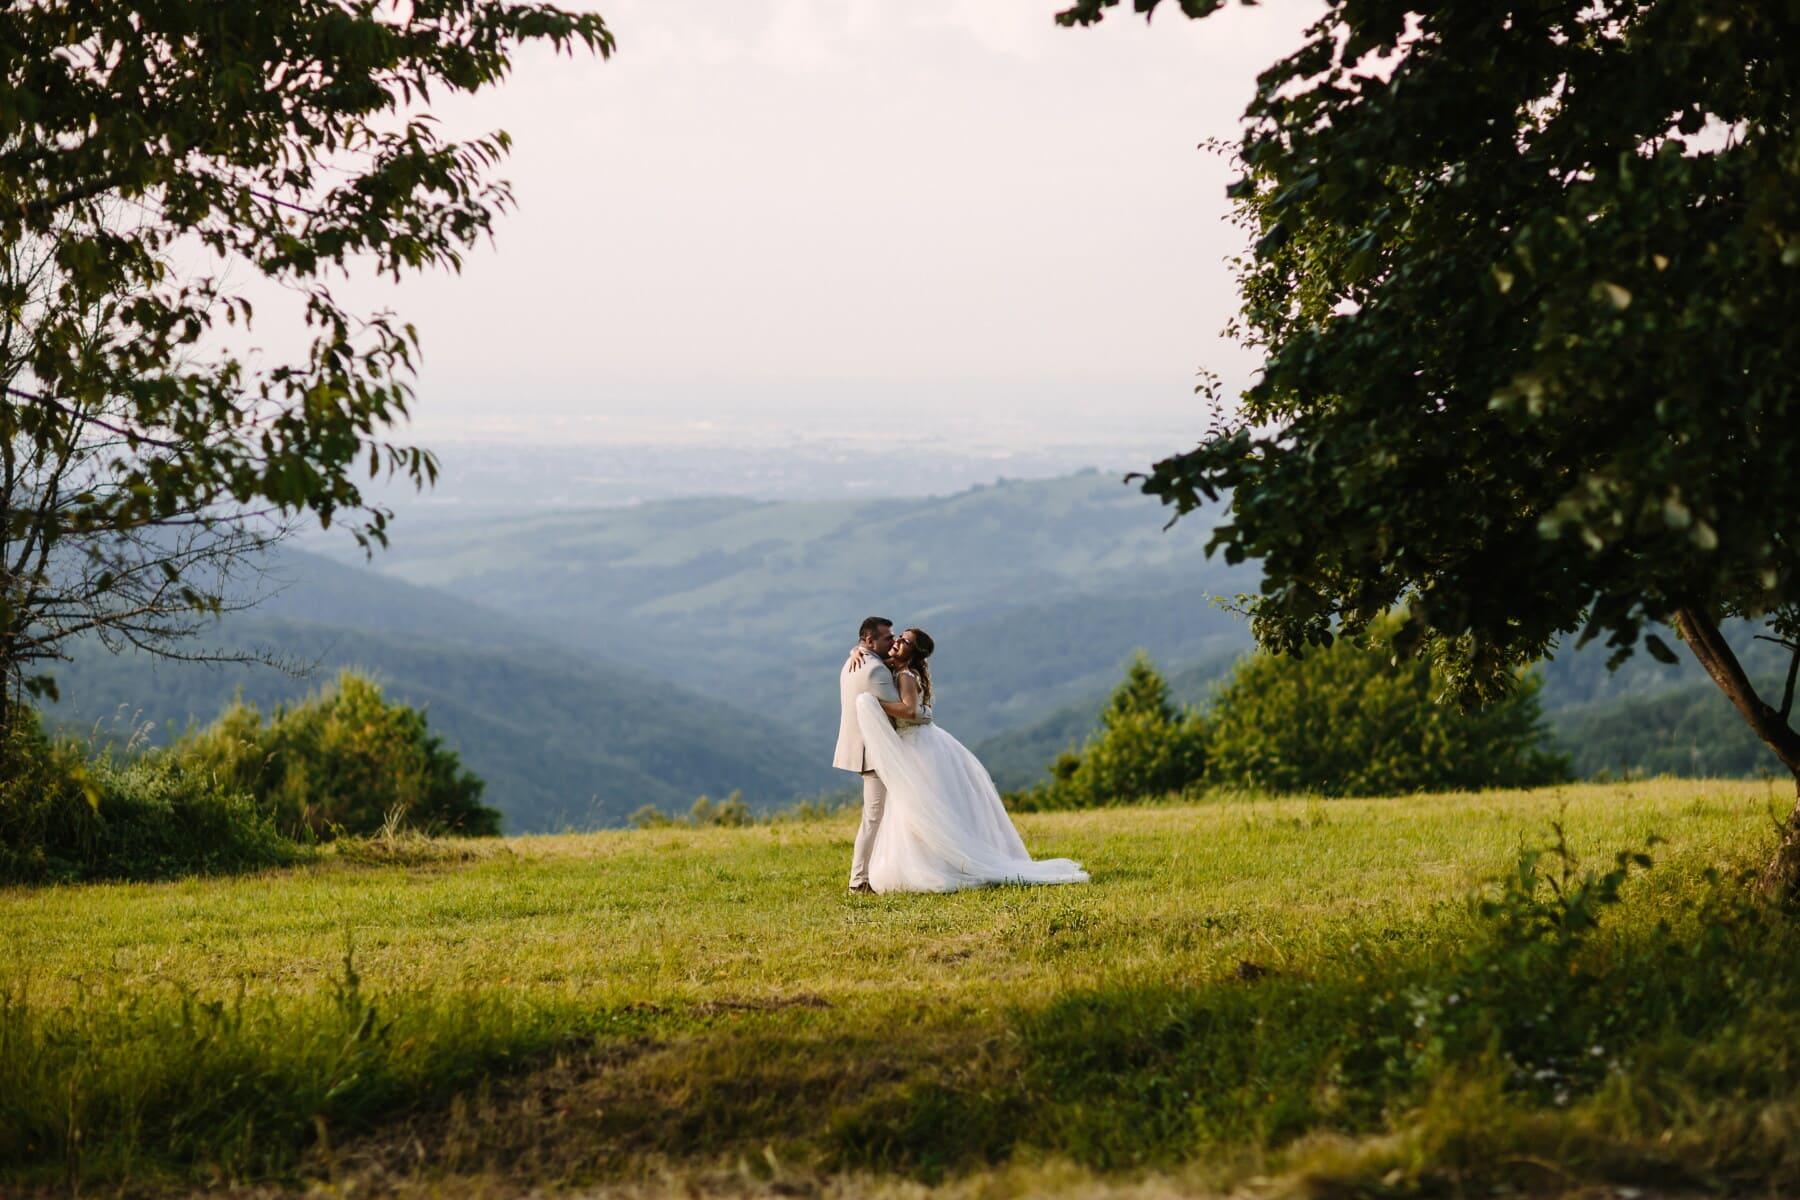 hugging, newlyweds, knoll, hillside, valley, hilltop, love, wedding, engagement, bride